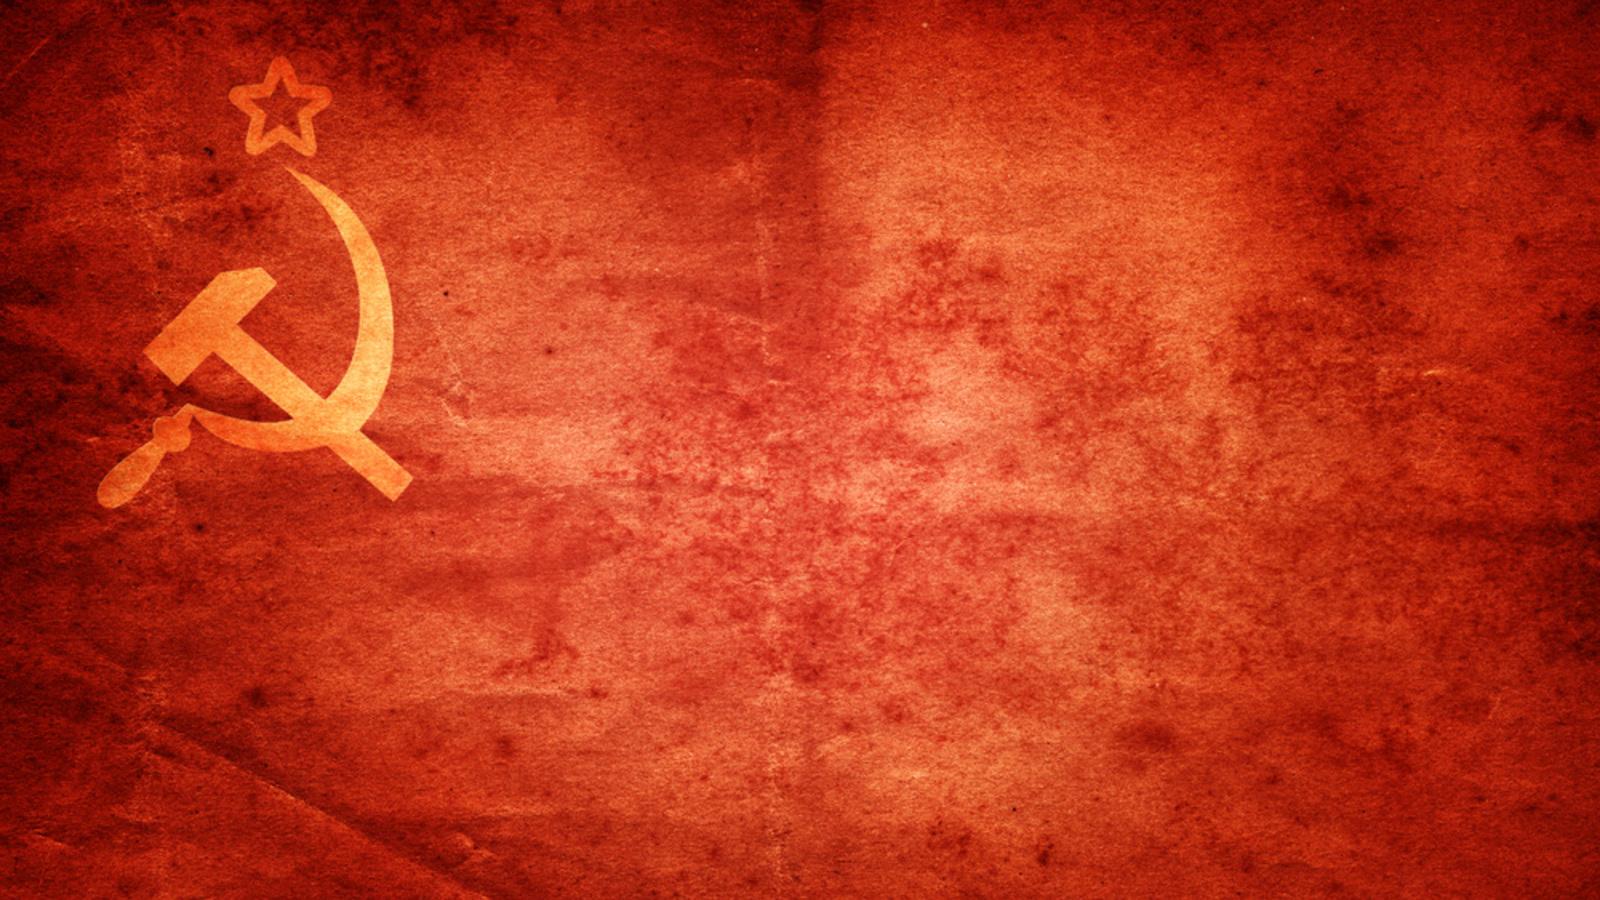 der-ewige-krieg-gegen-russland